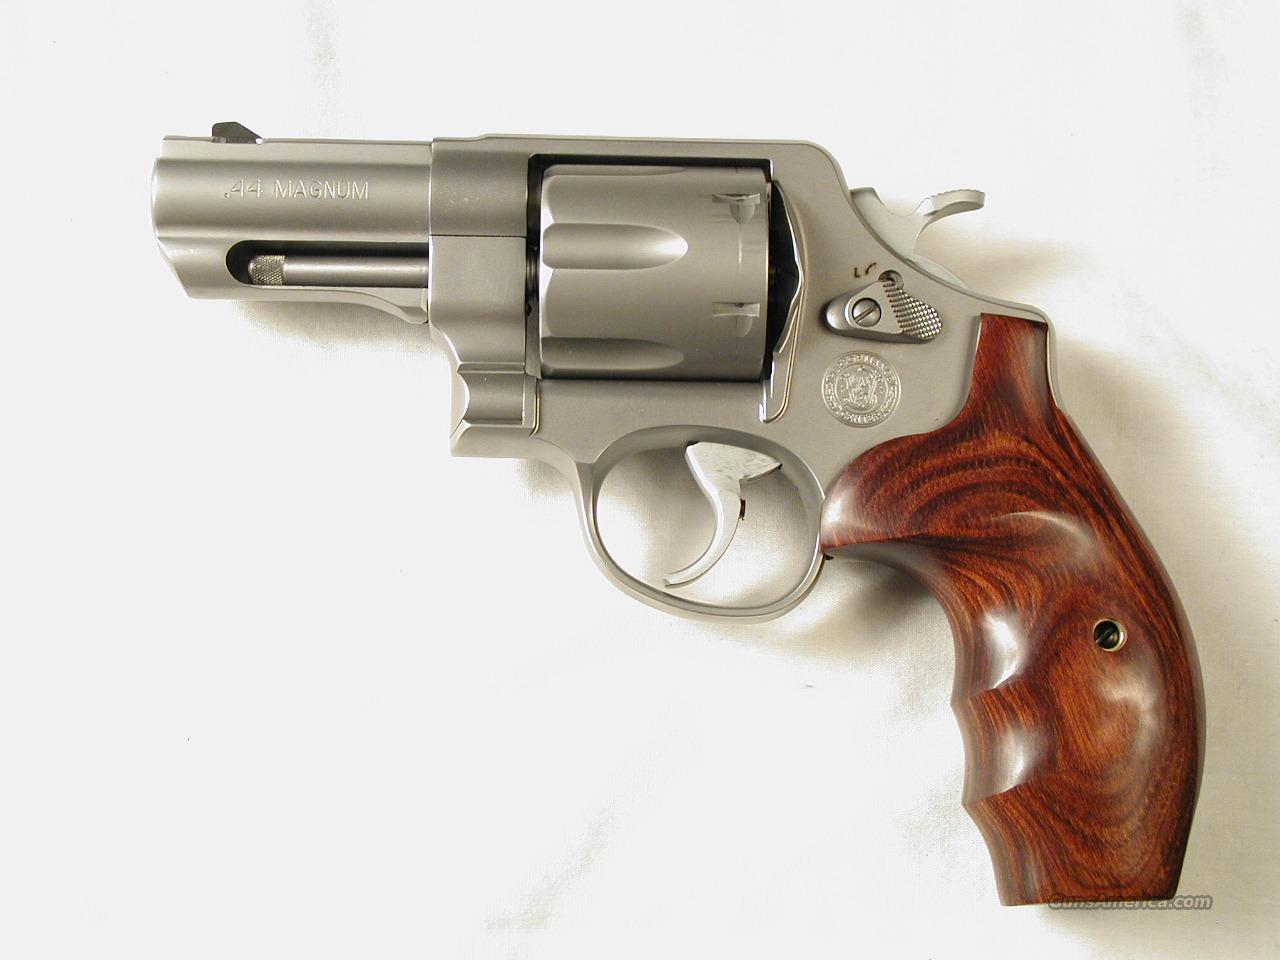 629 CARRY COMP  Guns > Pistols > Smith & Wesson Revolvers > Performance Center